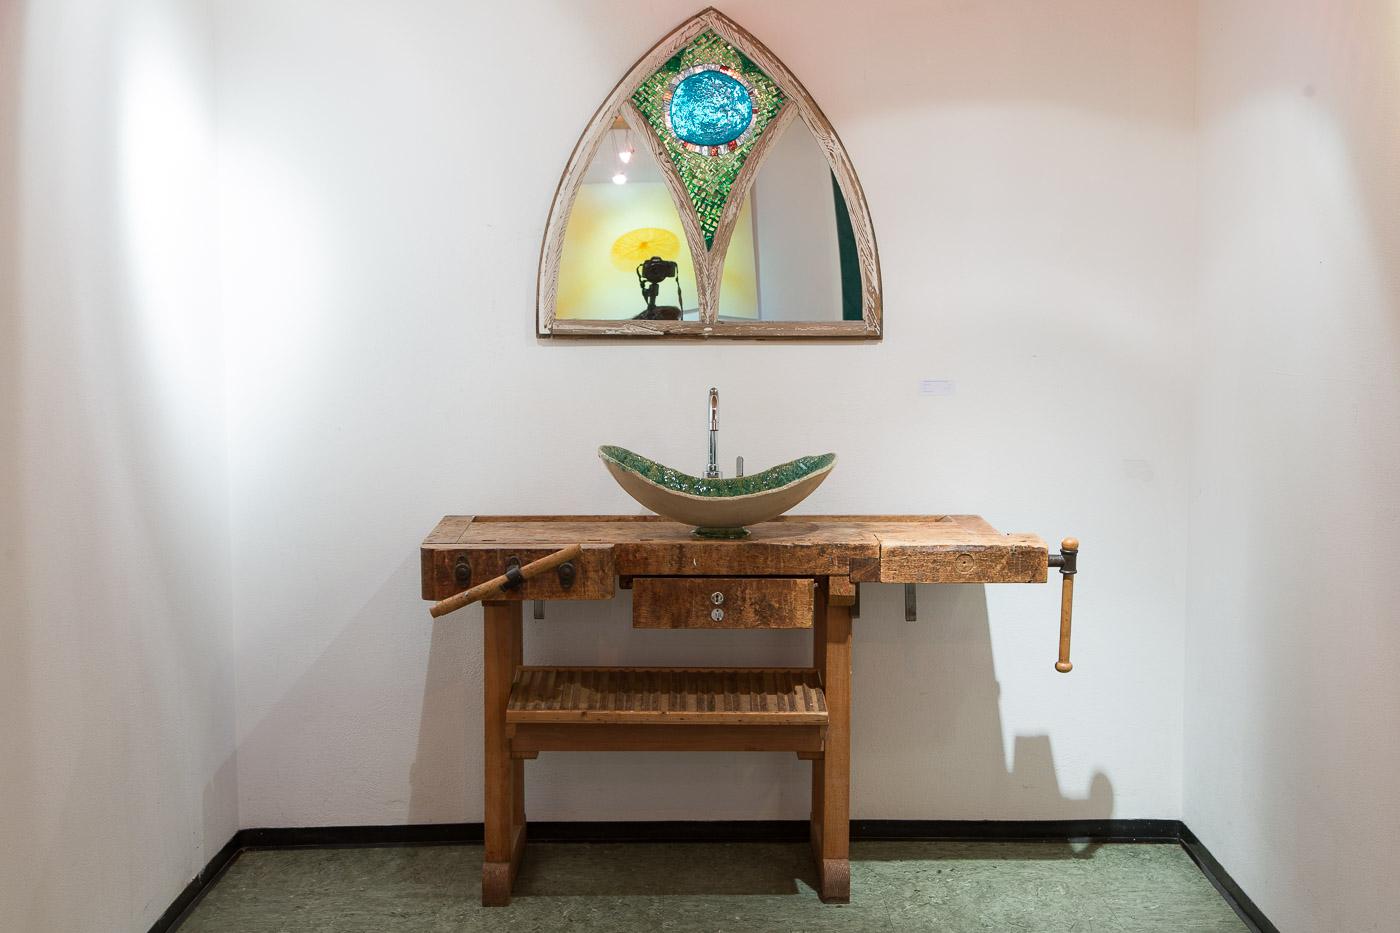 waschtisch atelier keramikeria keramik mosaik design. Black Bedroom Furniture Sets. Home Design Ideas